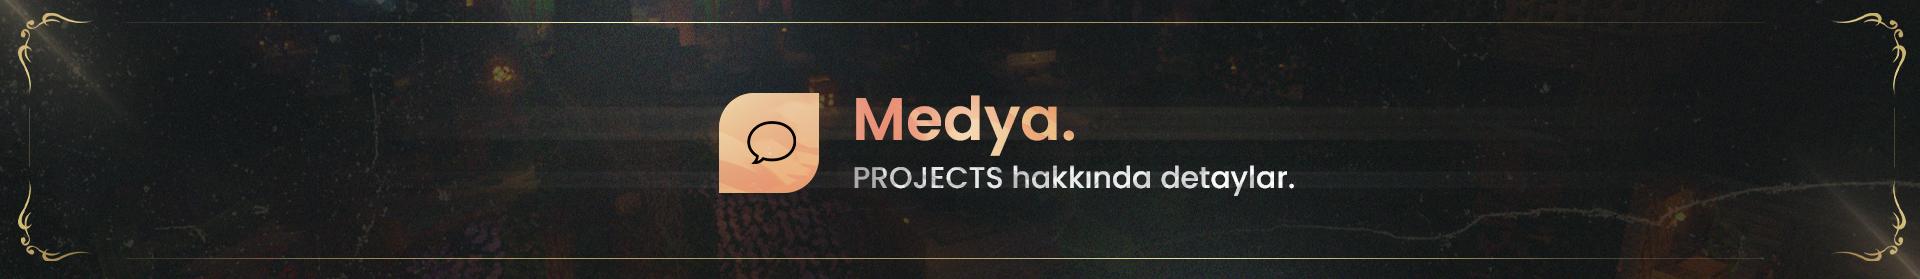 Medya.png